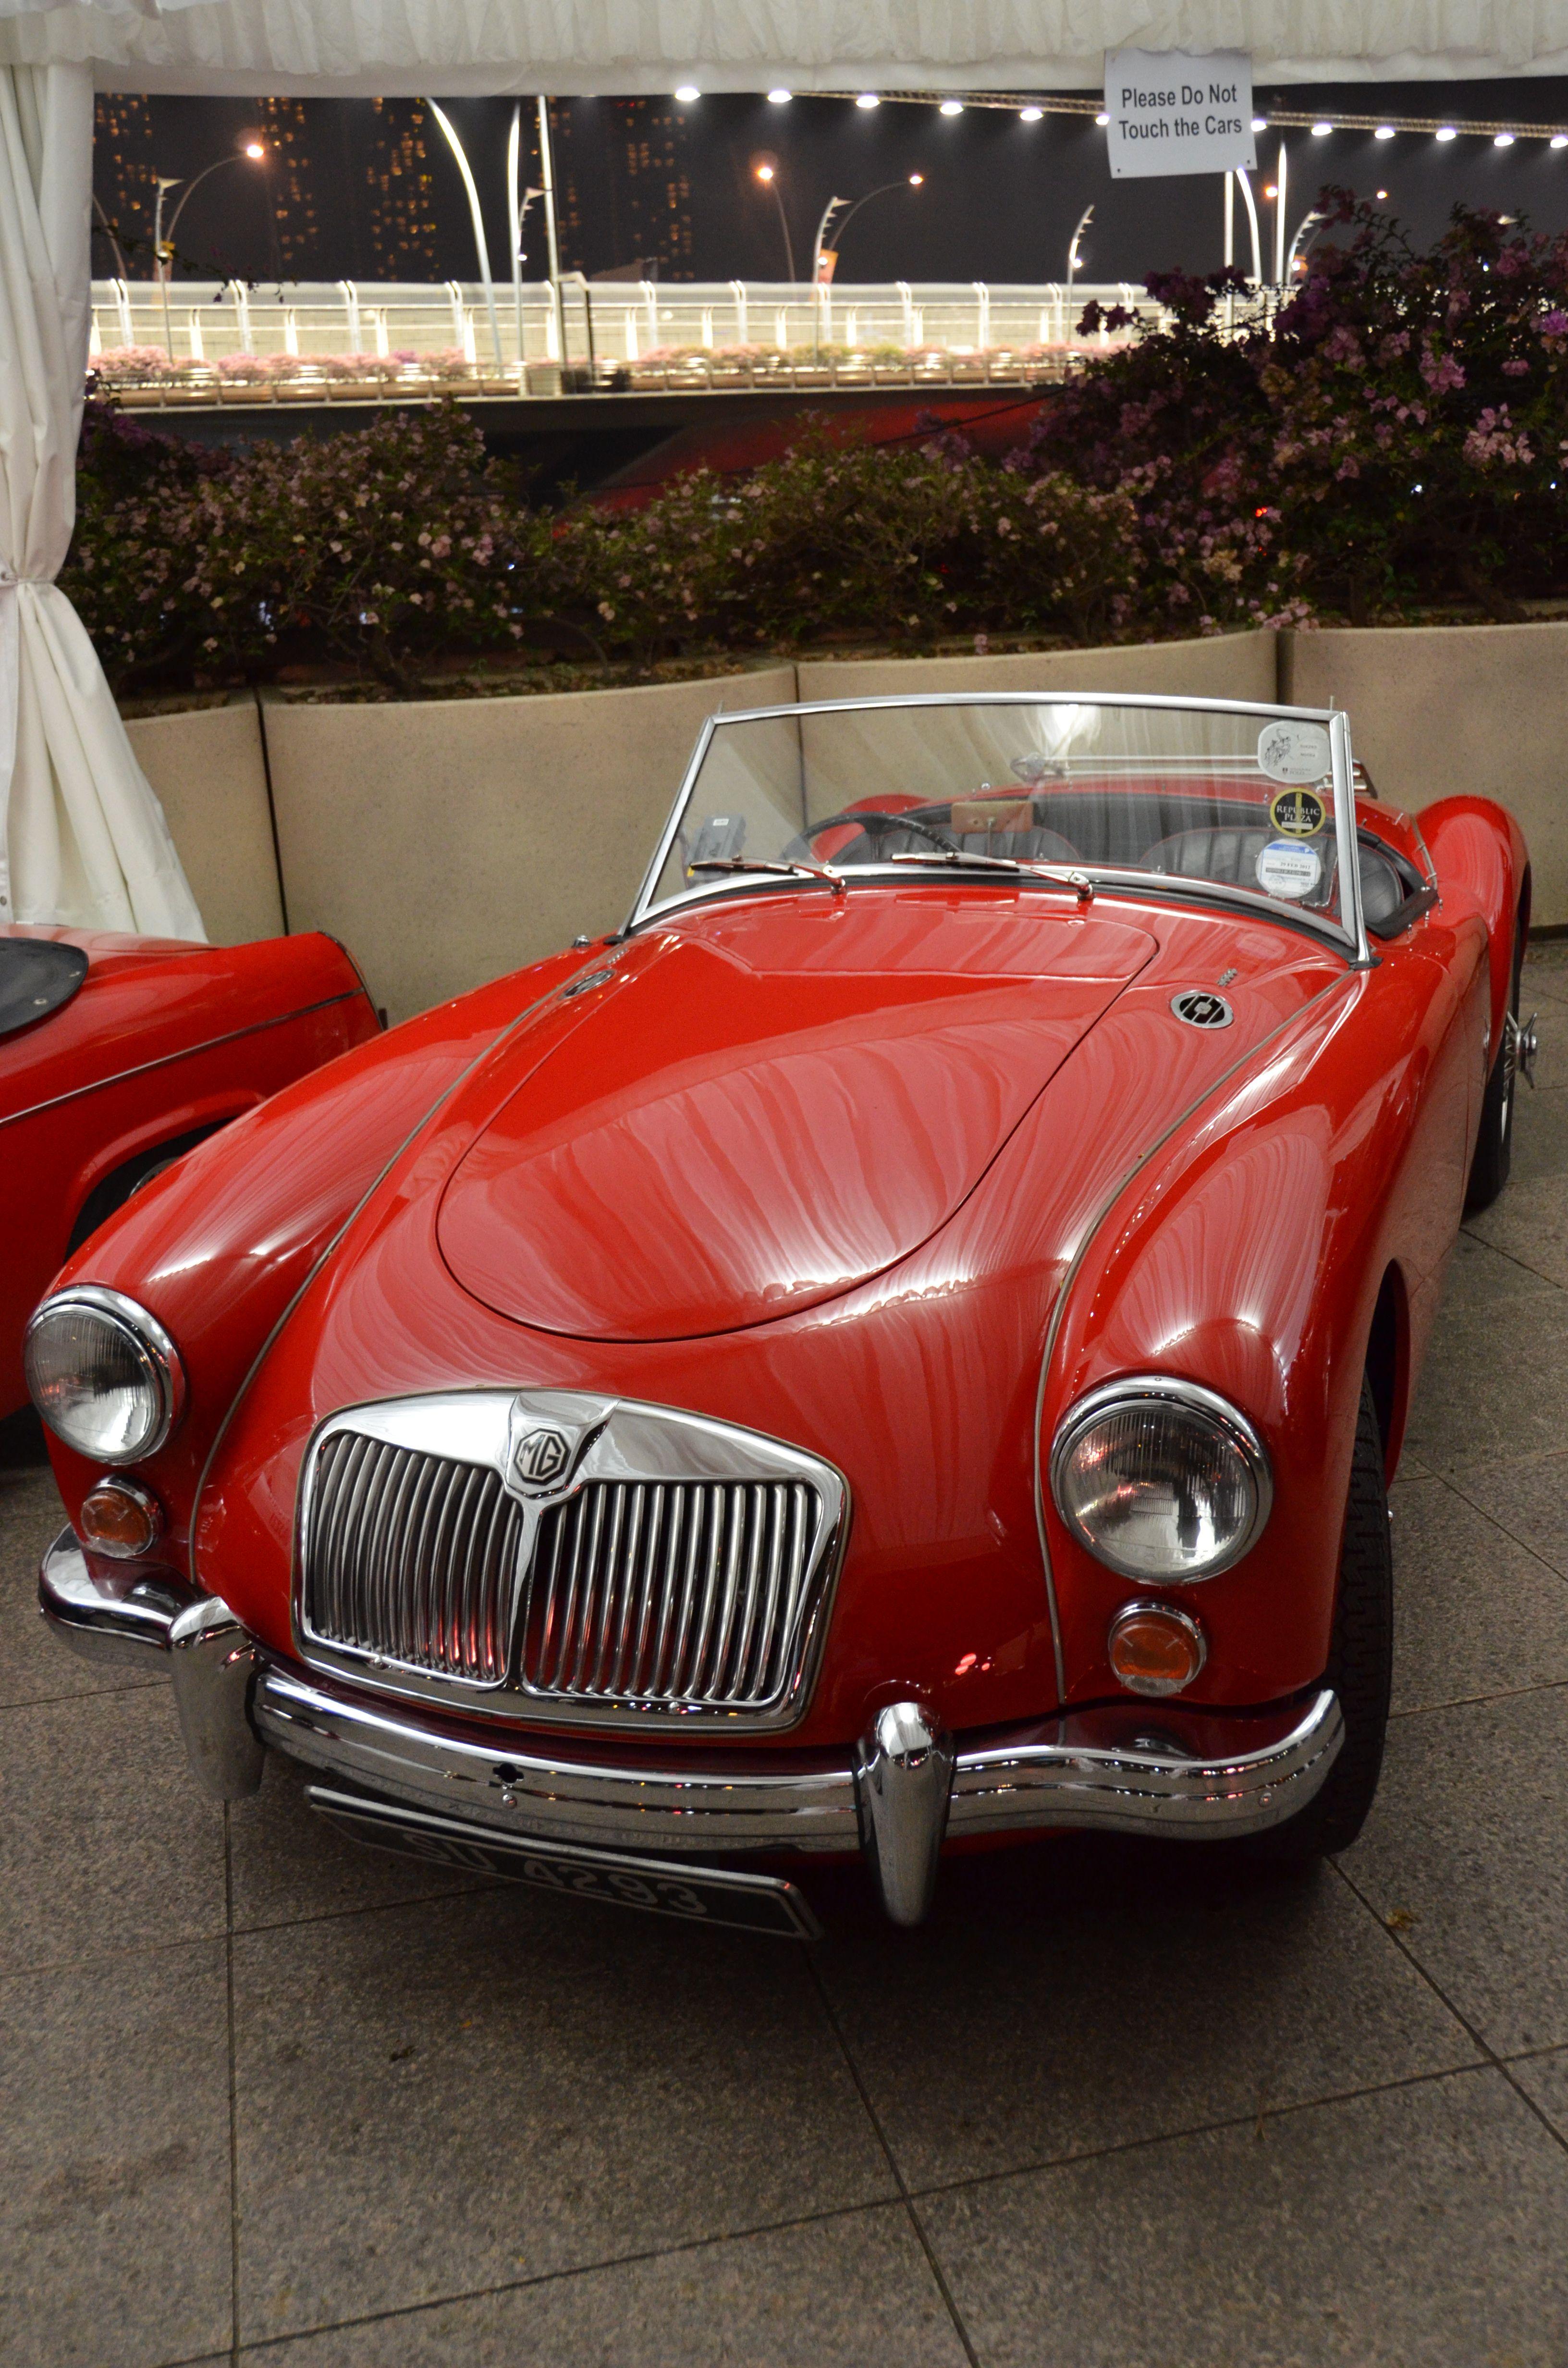 Vintage - Morris Garages, MG Car Company. | Other Morris Cars ...